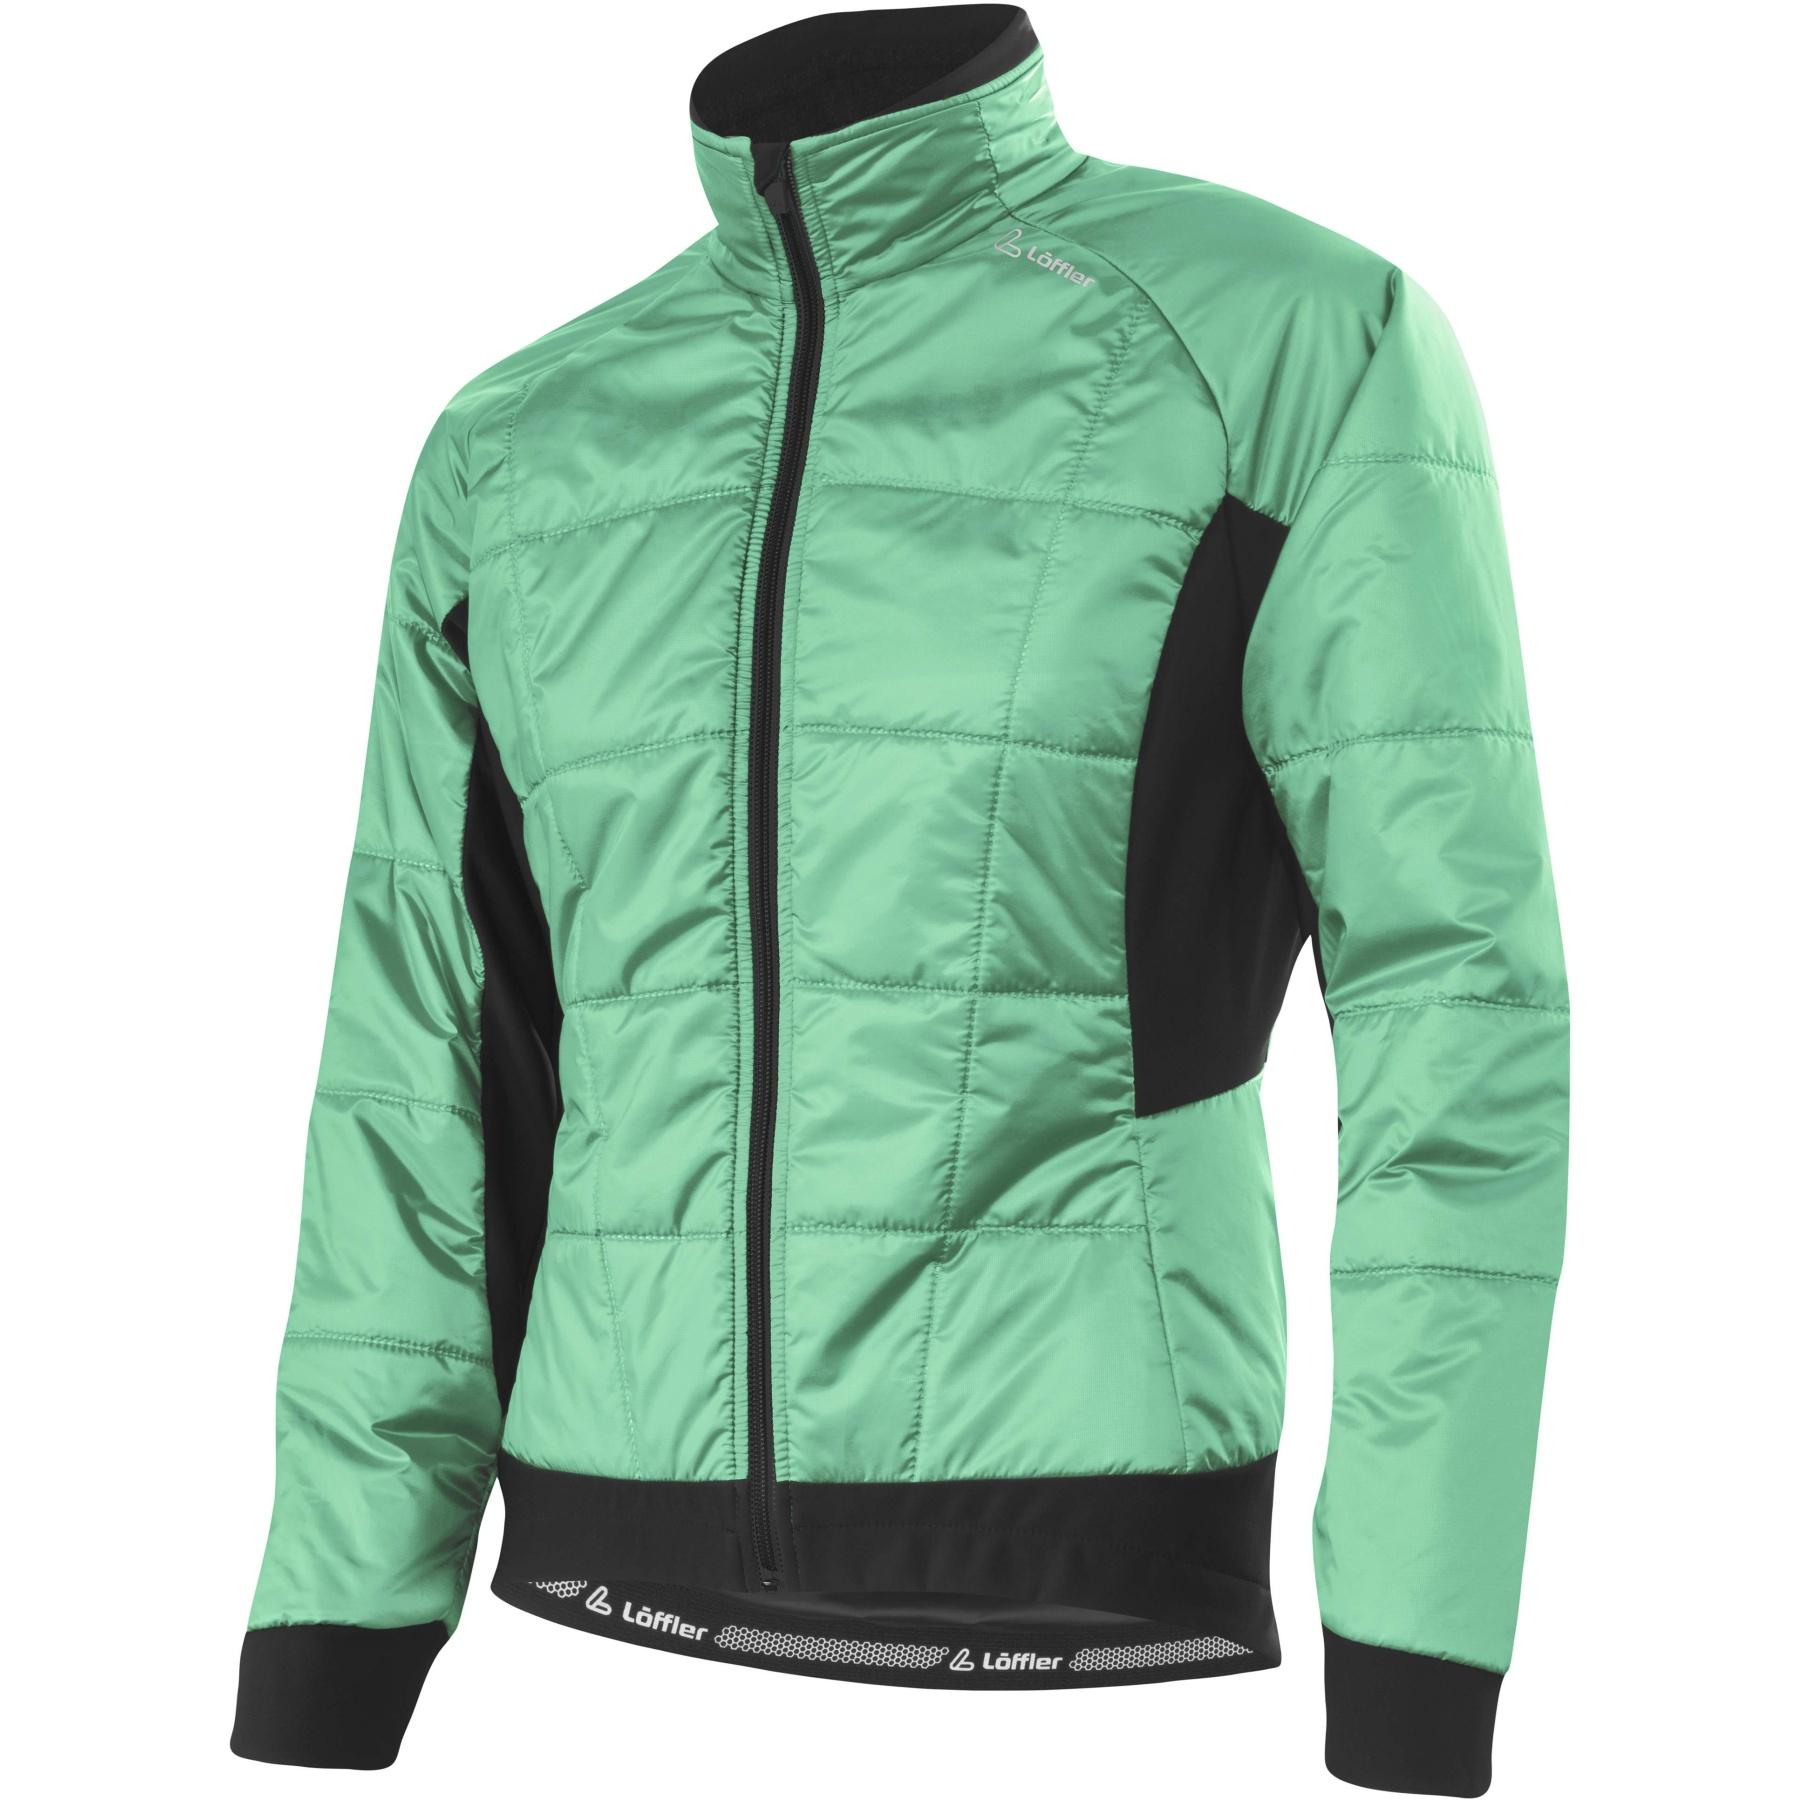 Löffler Bike Iso Jacke Hotbond® PL60 Damen 20603 - jade 354